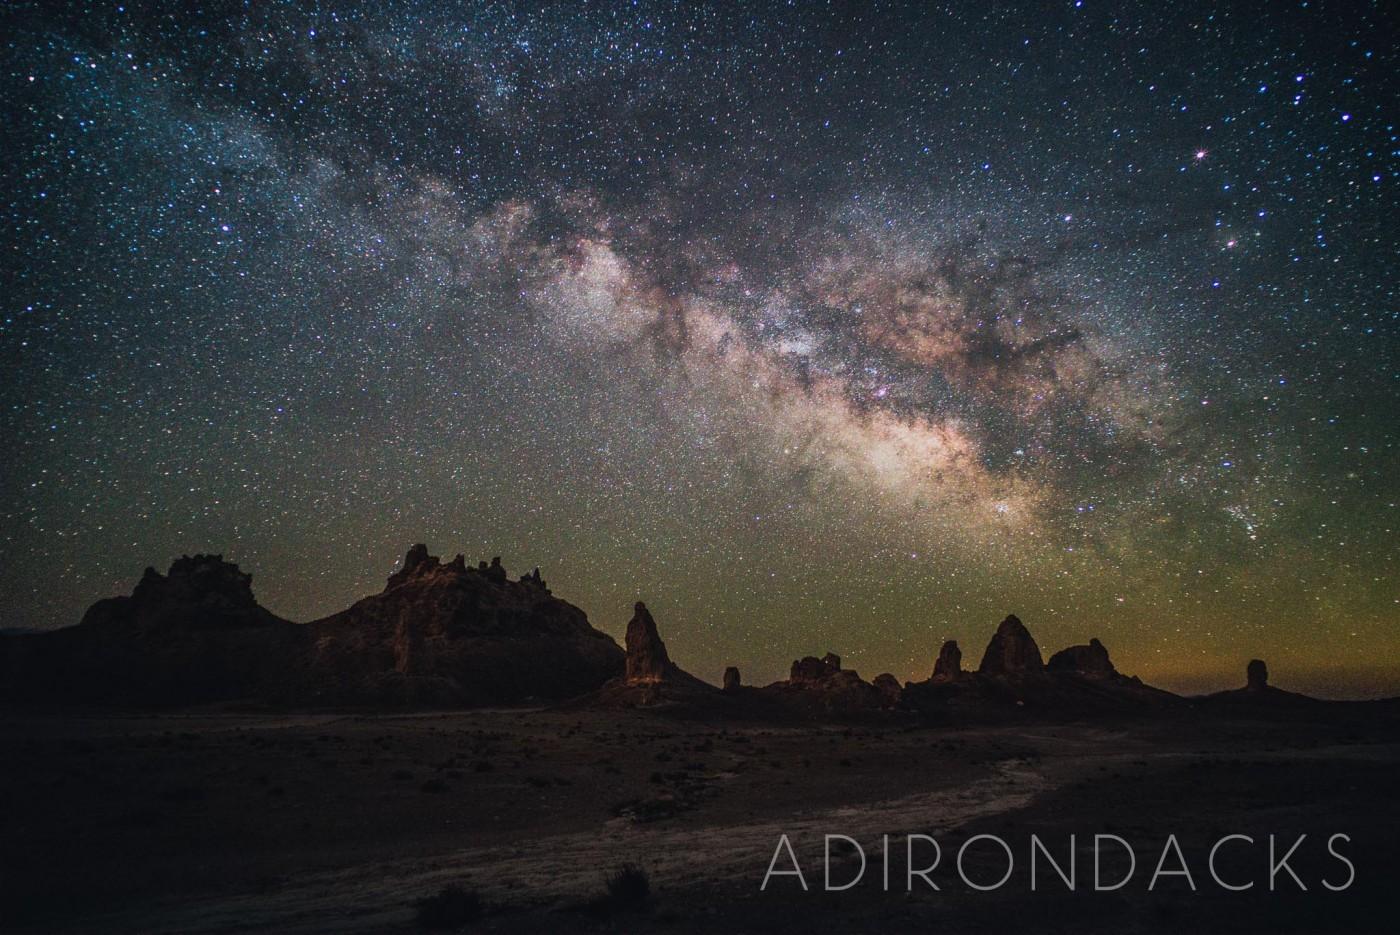 adirondacks-milky-way-astrophotography-lonely-speck-lightroom-preset-1